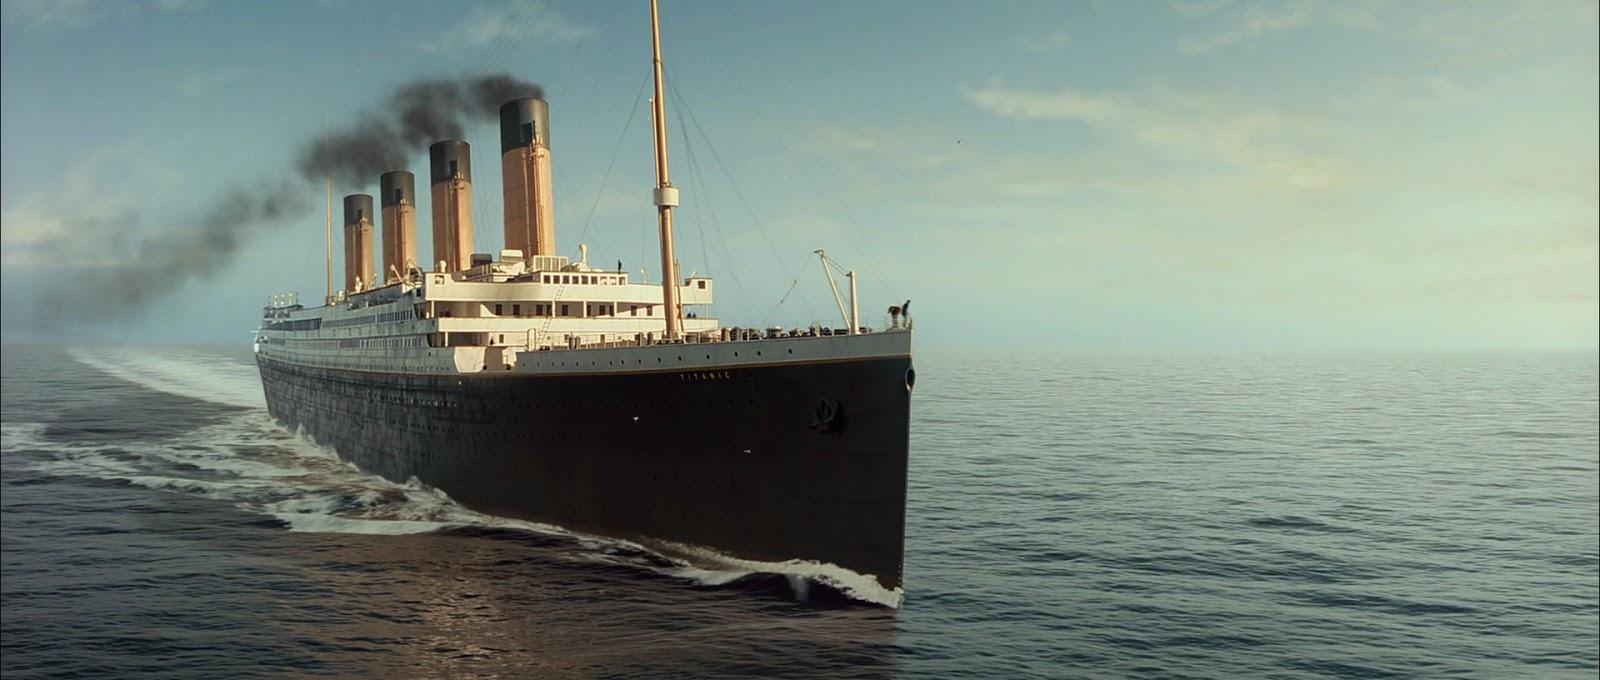 Titanic Ii (Elokuva)